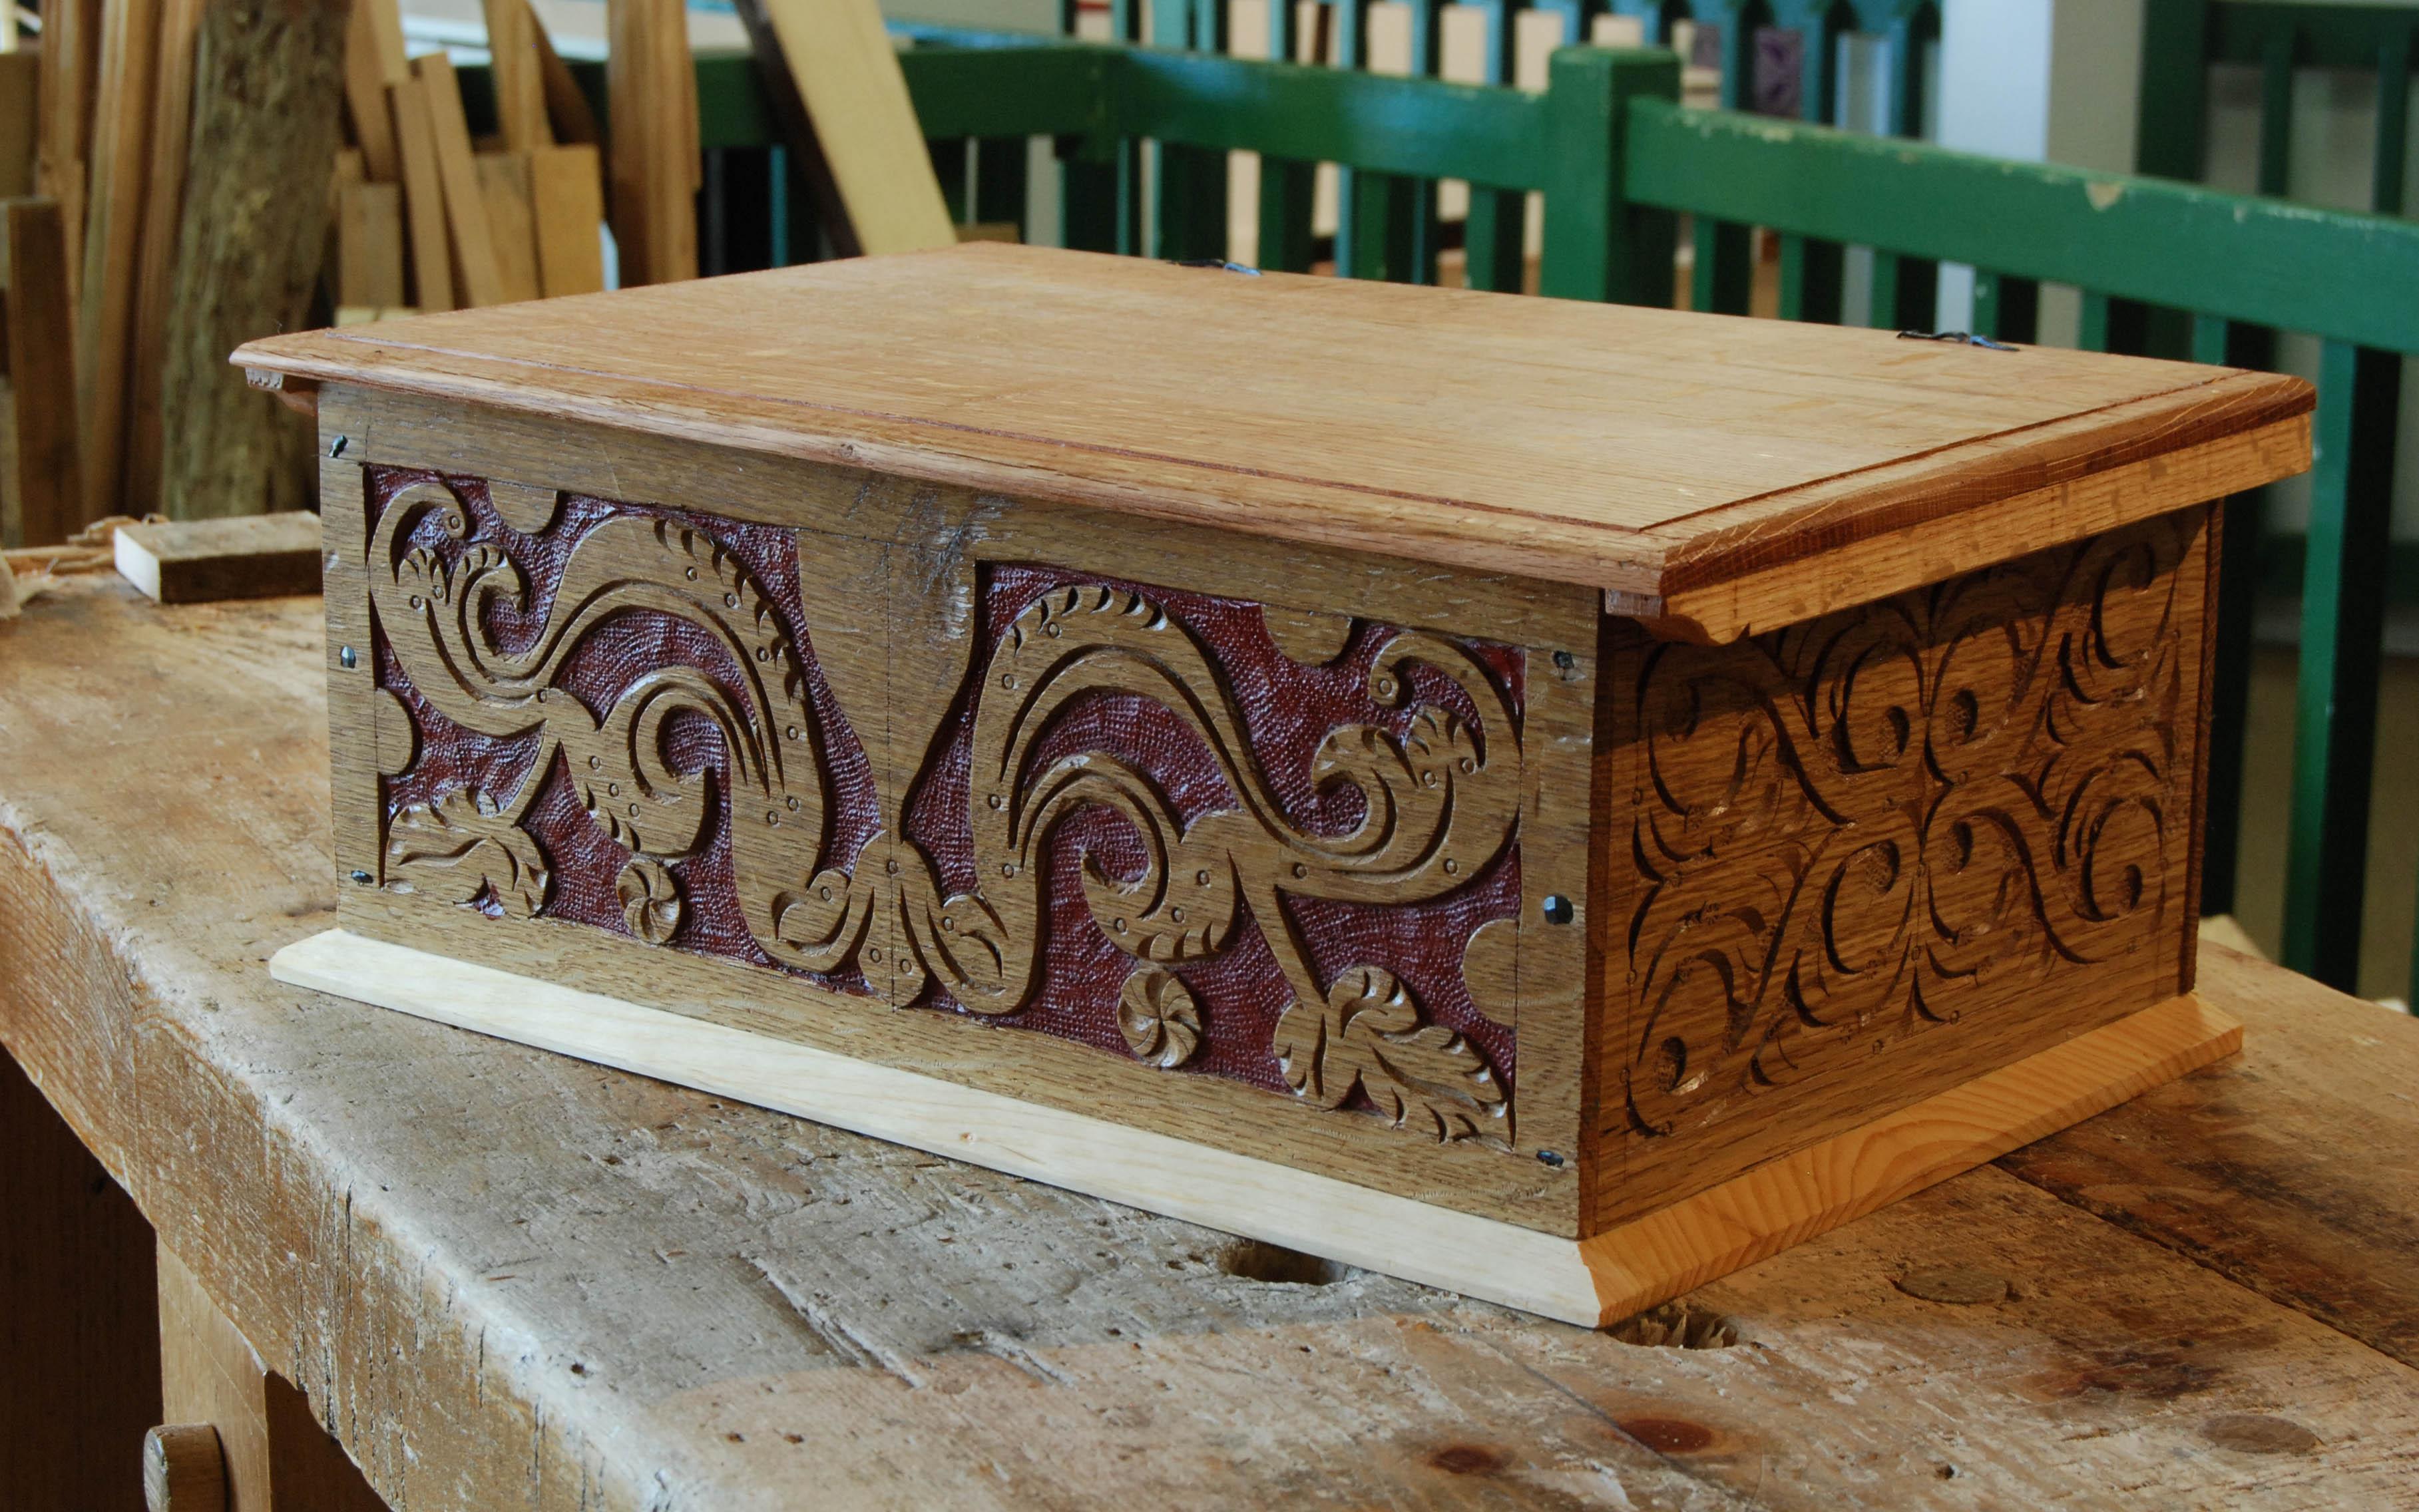 carved box, May 2013